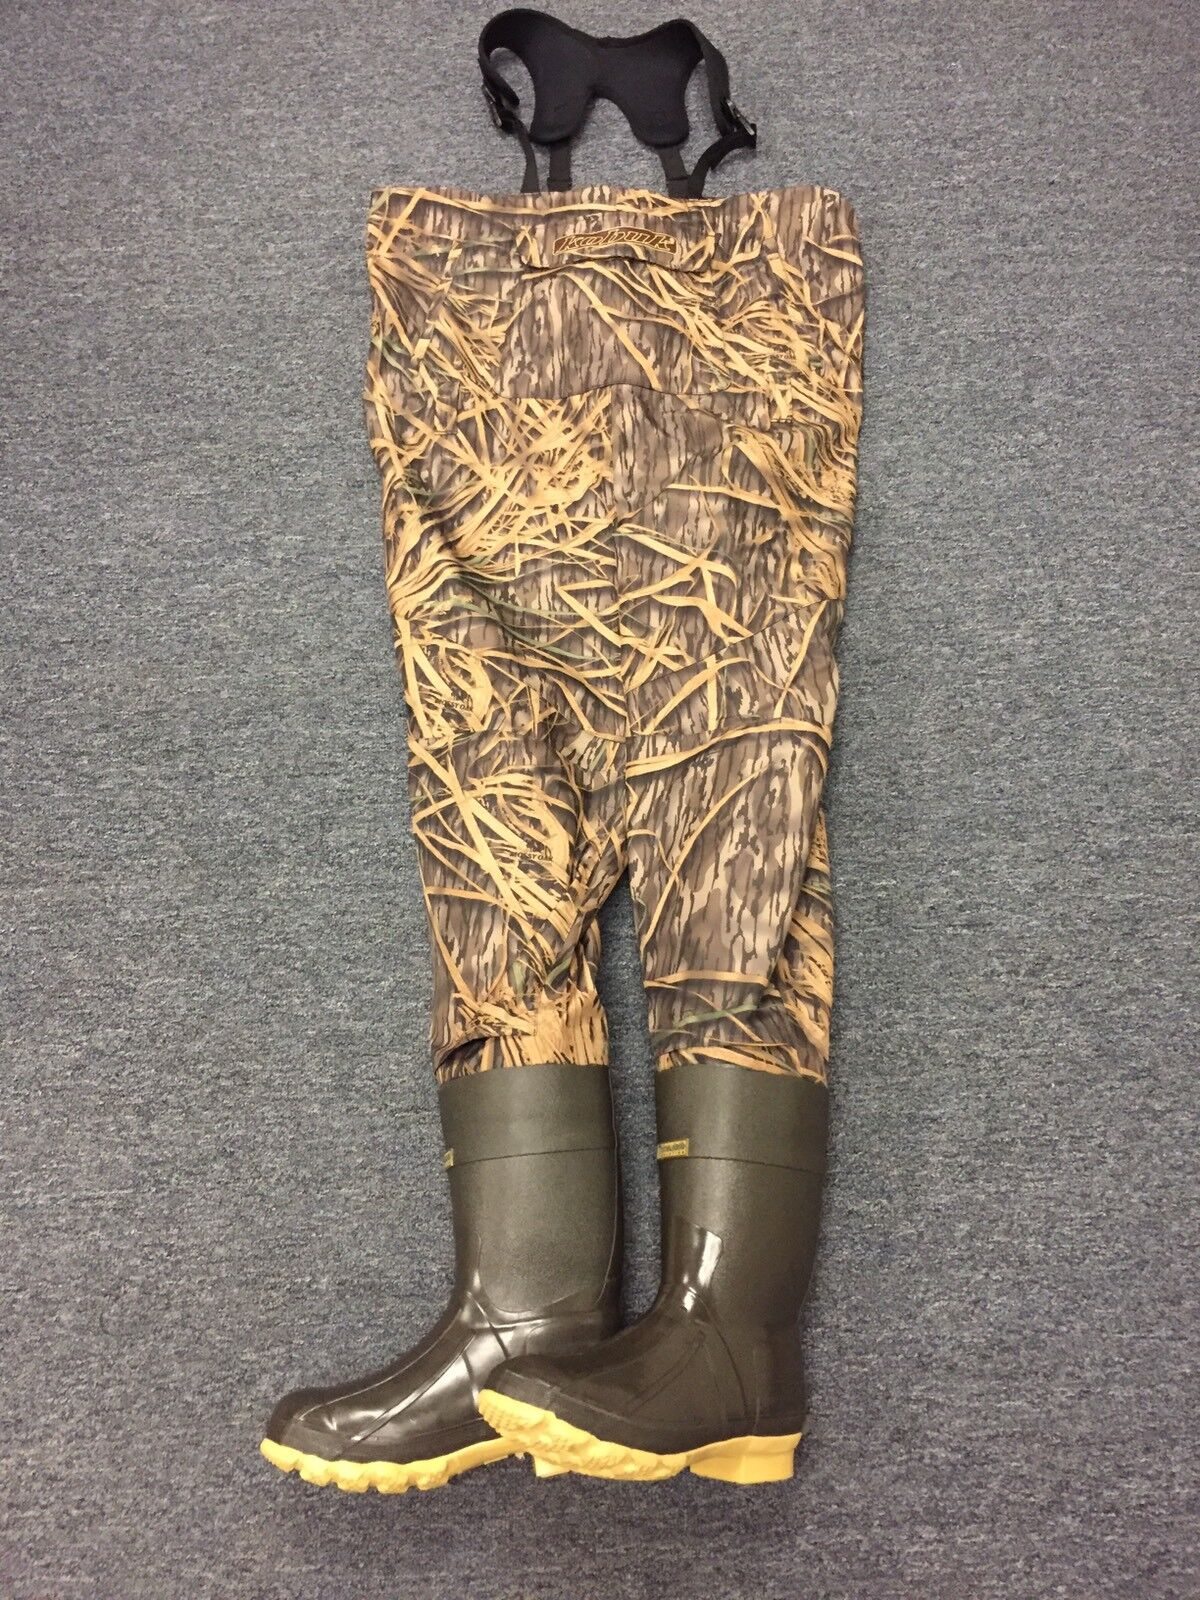 NEW Kobuk Men's Shadow Grass Premium Breathable Hunting Wader Lug Boots Size 13R